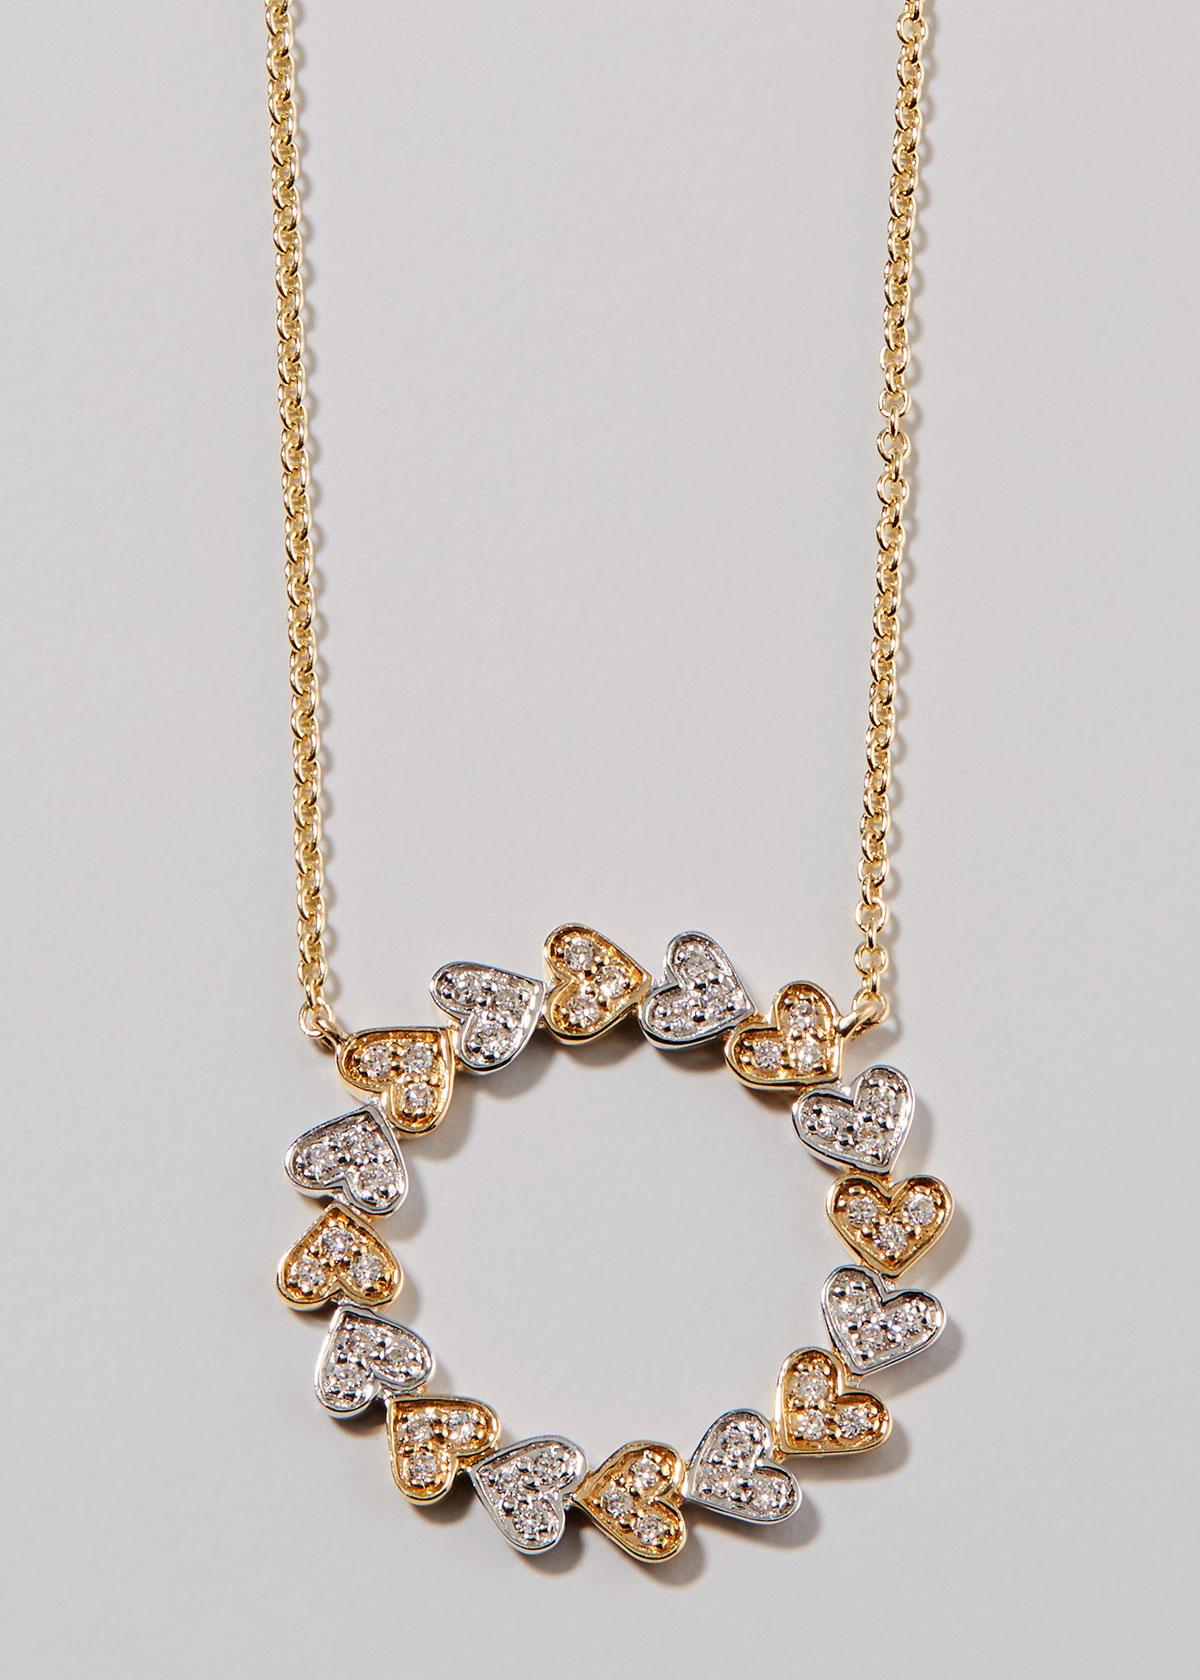 Sydney Evan 14K YELLOW & WHITE GOLD DIAMOND HEART CIRCLE NECKLACE